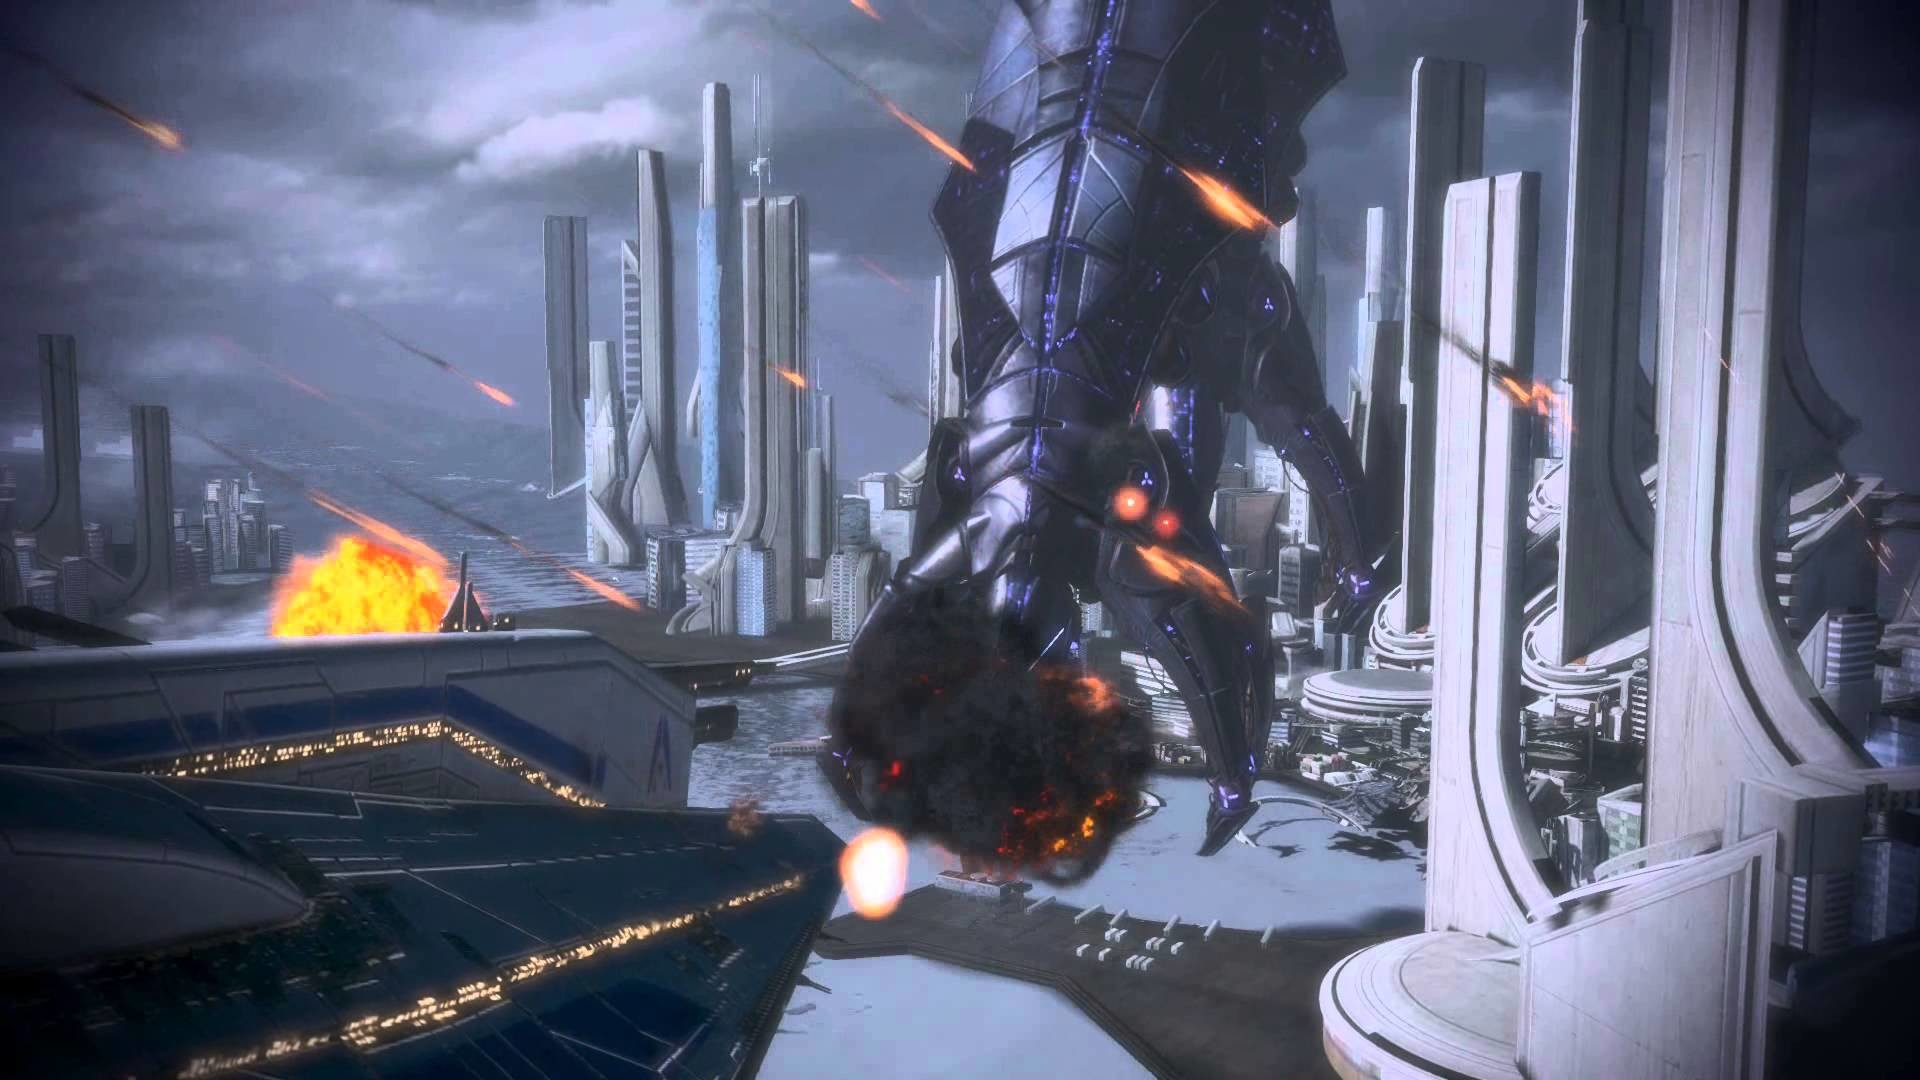 Mass Effect 3 Reaper vs. Dreadnaught 1 Dreamscene Video Wallpaper – YouTube